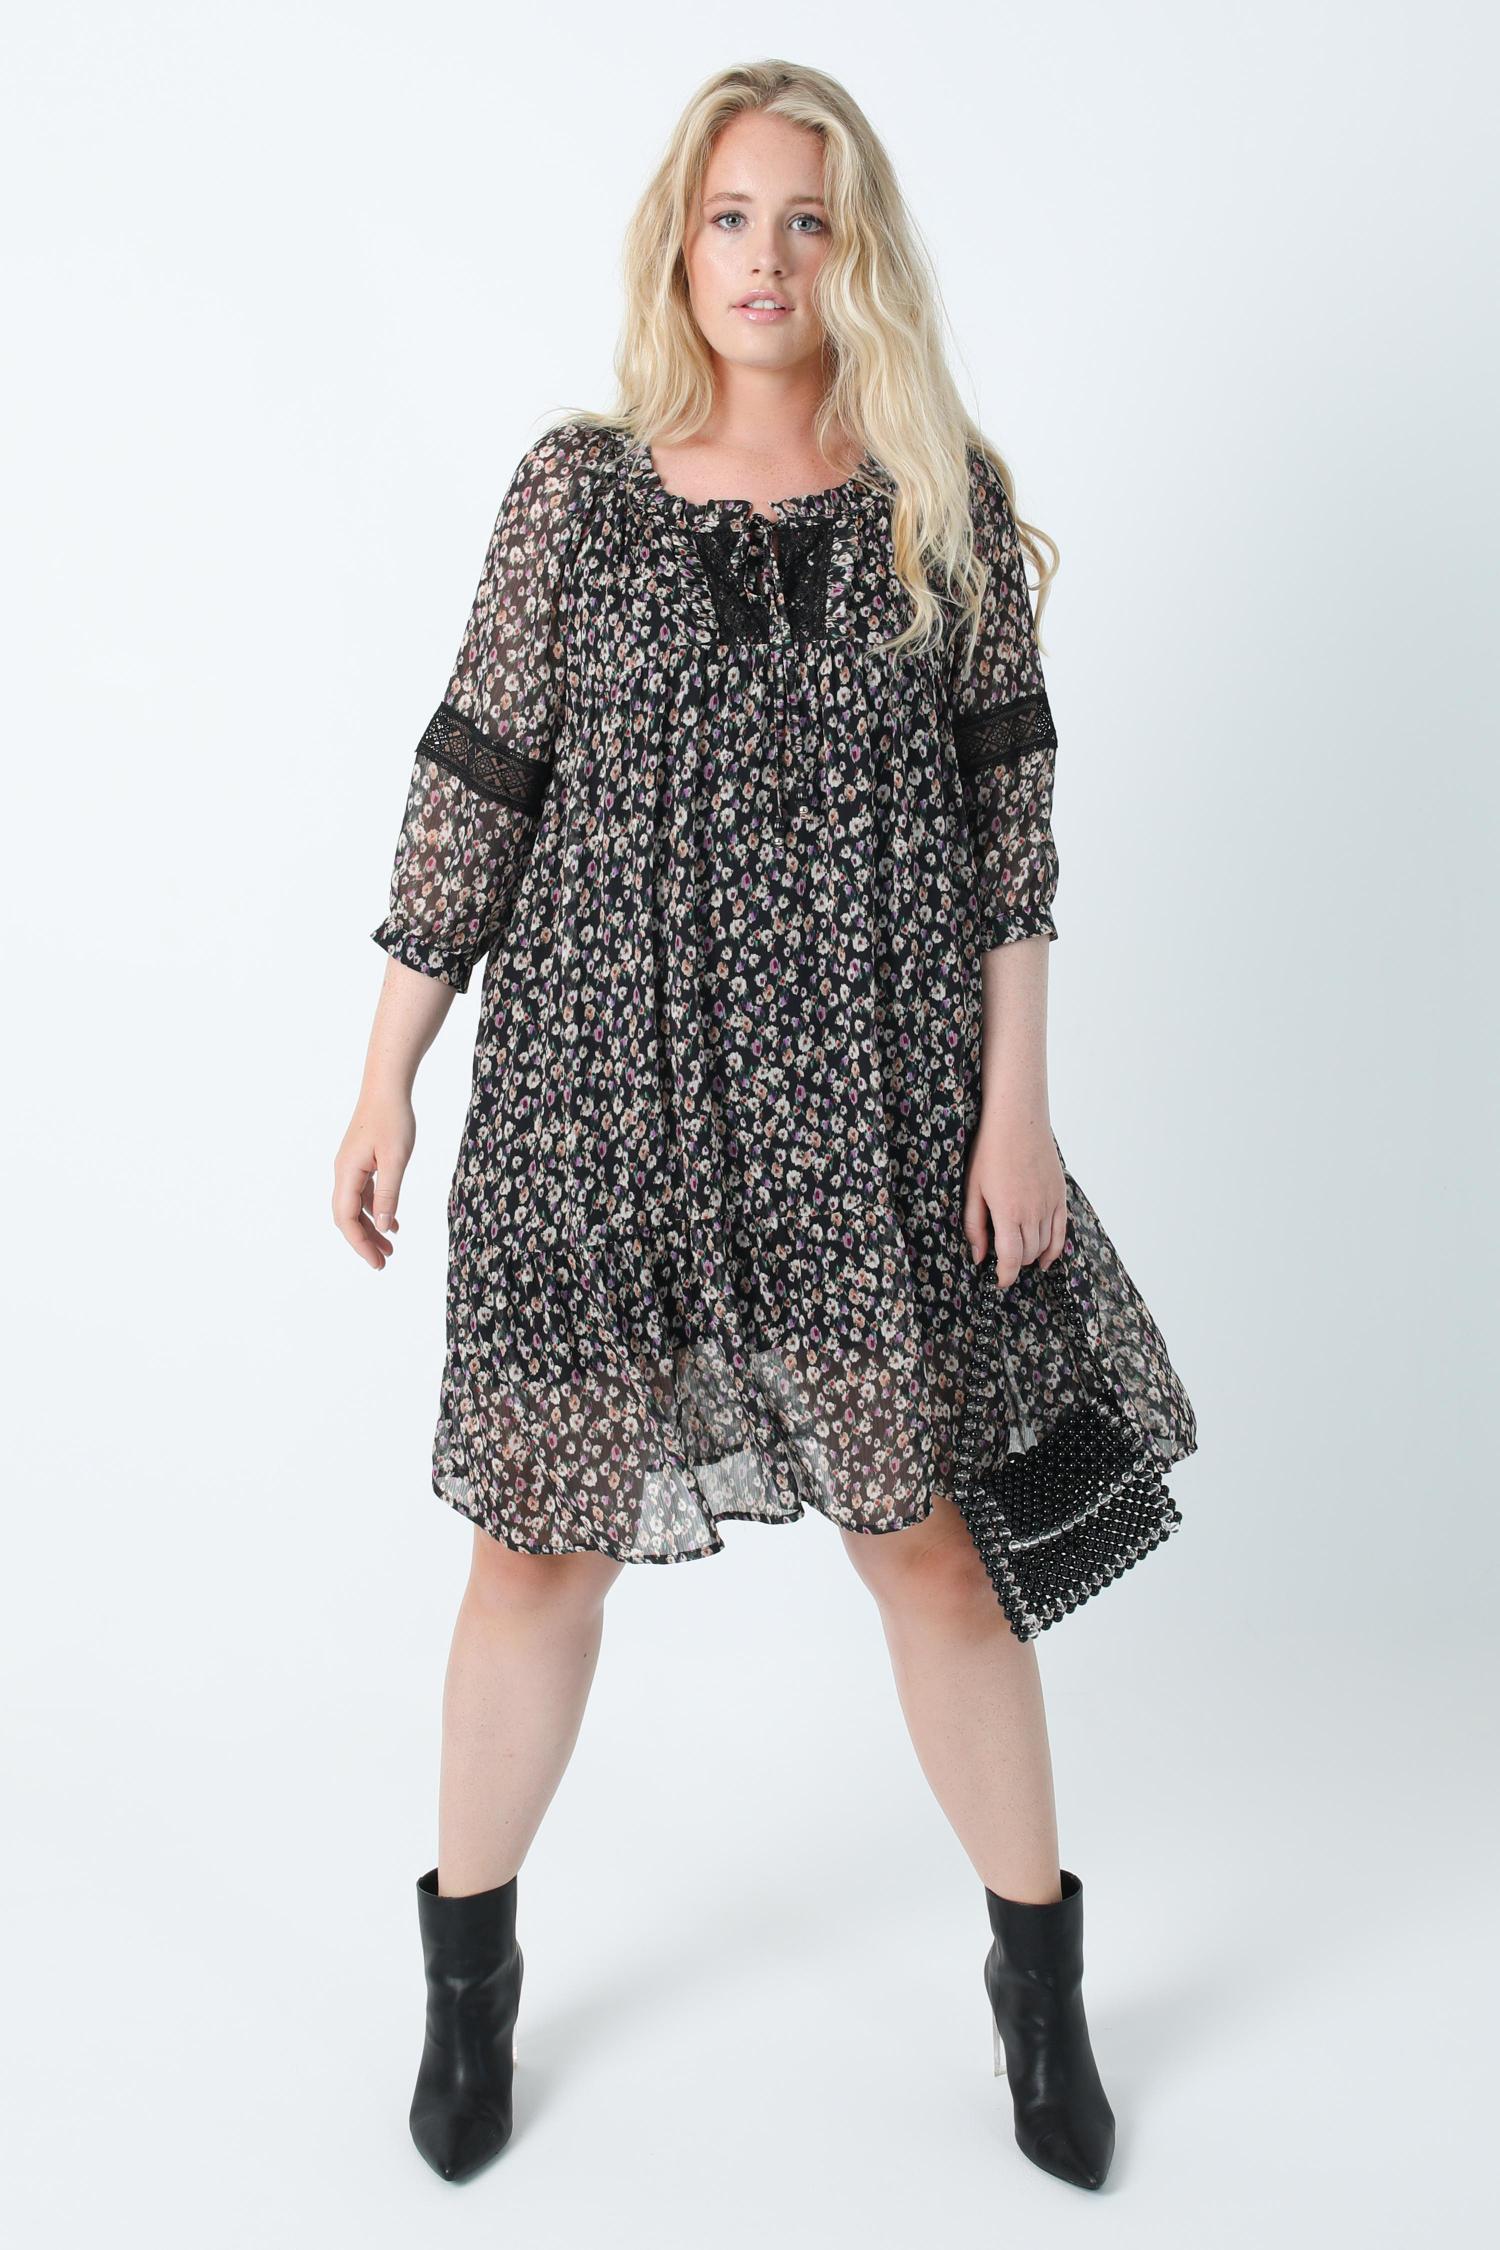 Long tunic in printed veil and macramé oeko-tex fabric (shipping September 10/15)